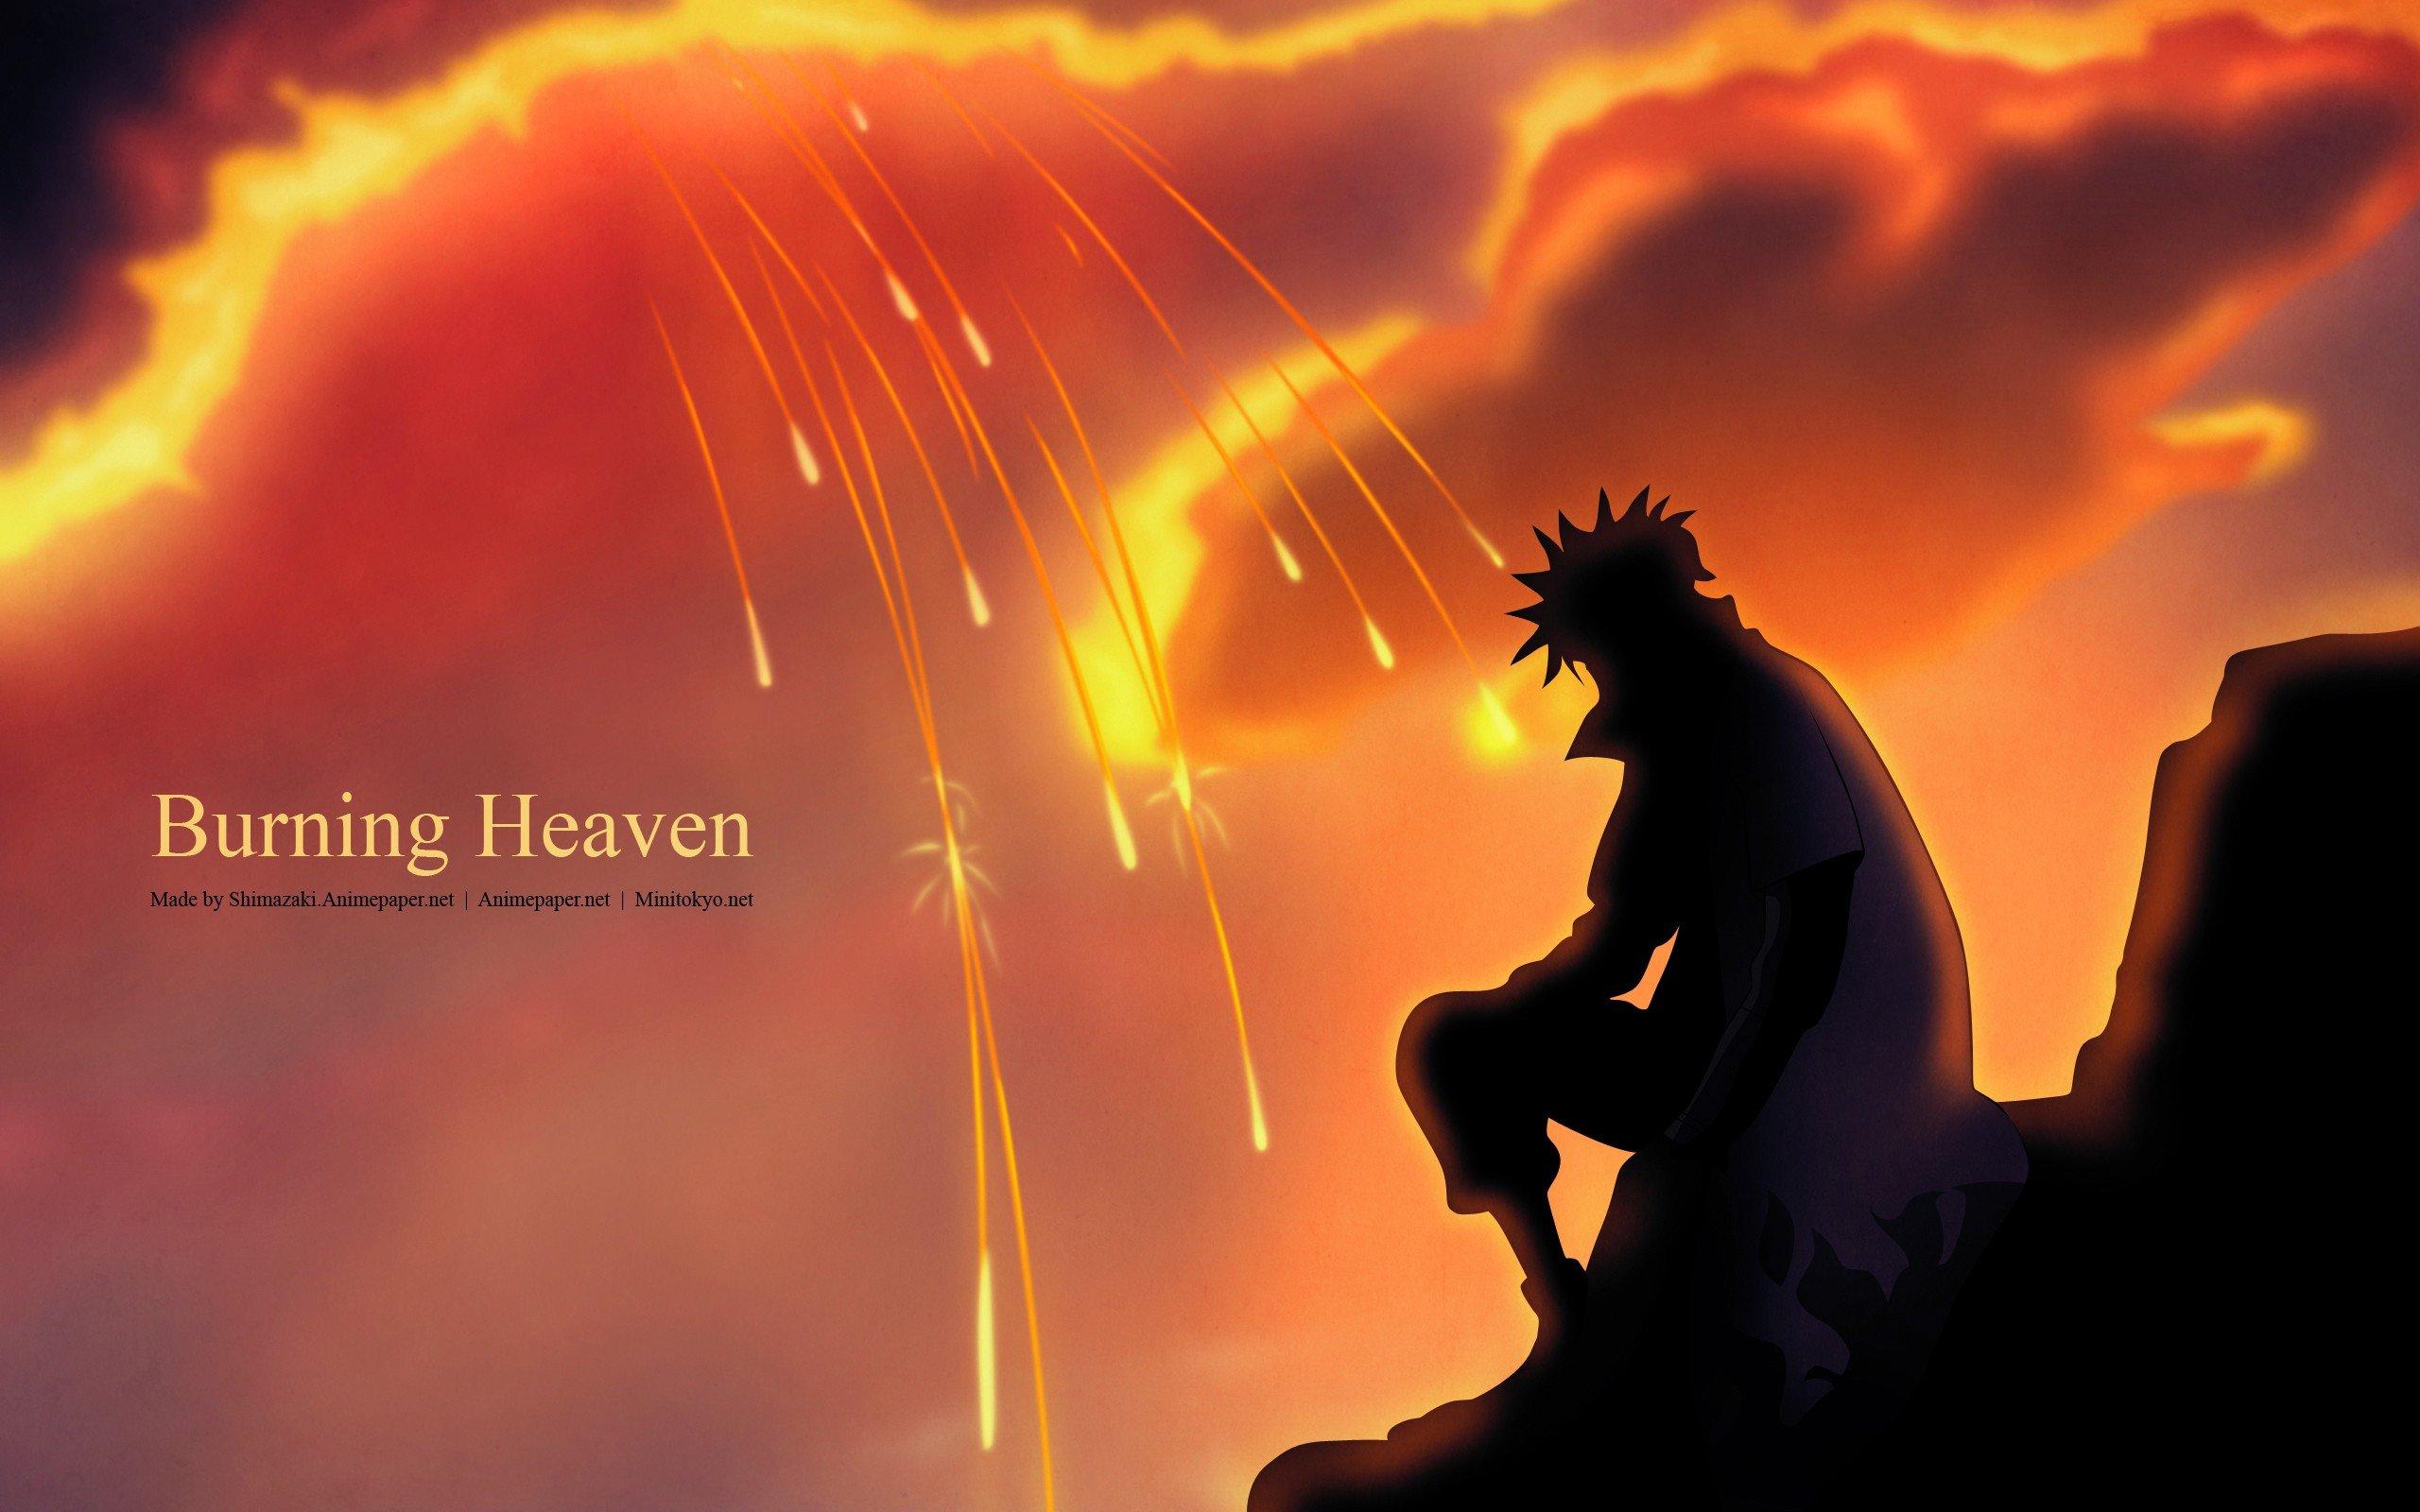 Wonderful Wallpaper Naruto Silhouette - 85363-Naruto_Shippuuden-manga-anime-Namikaze_Minato-silhouette  Picture.jpg